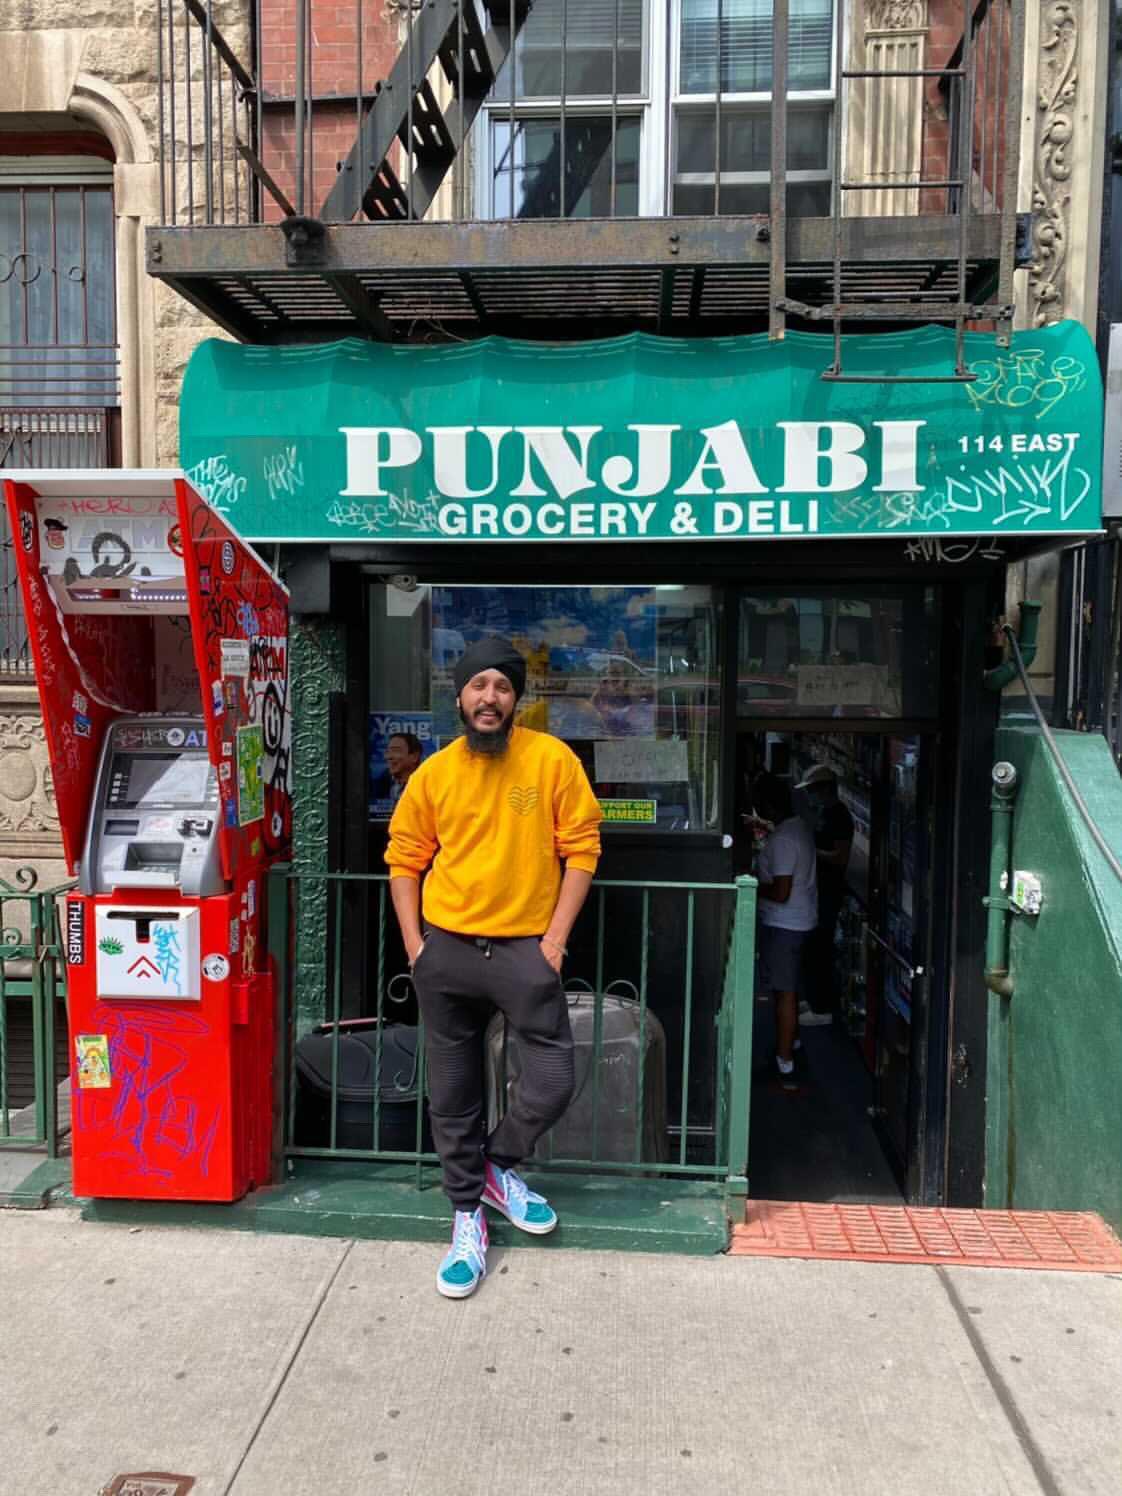 Gurpreet standing in front of the Punjabi Grocery & Deli in New York City